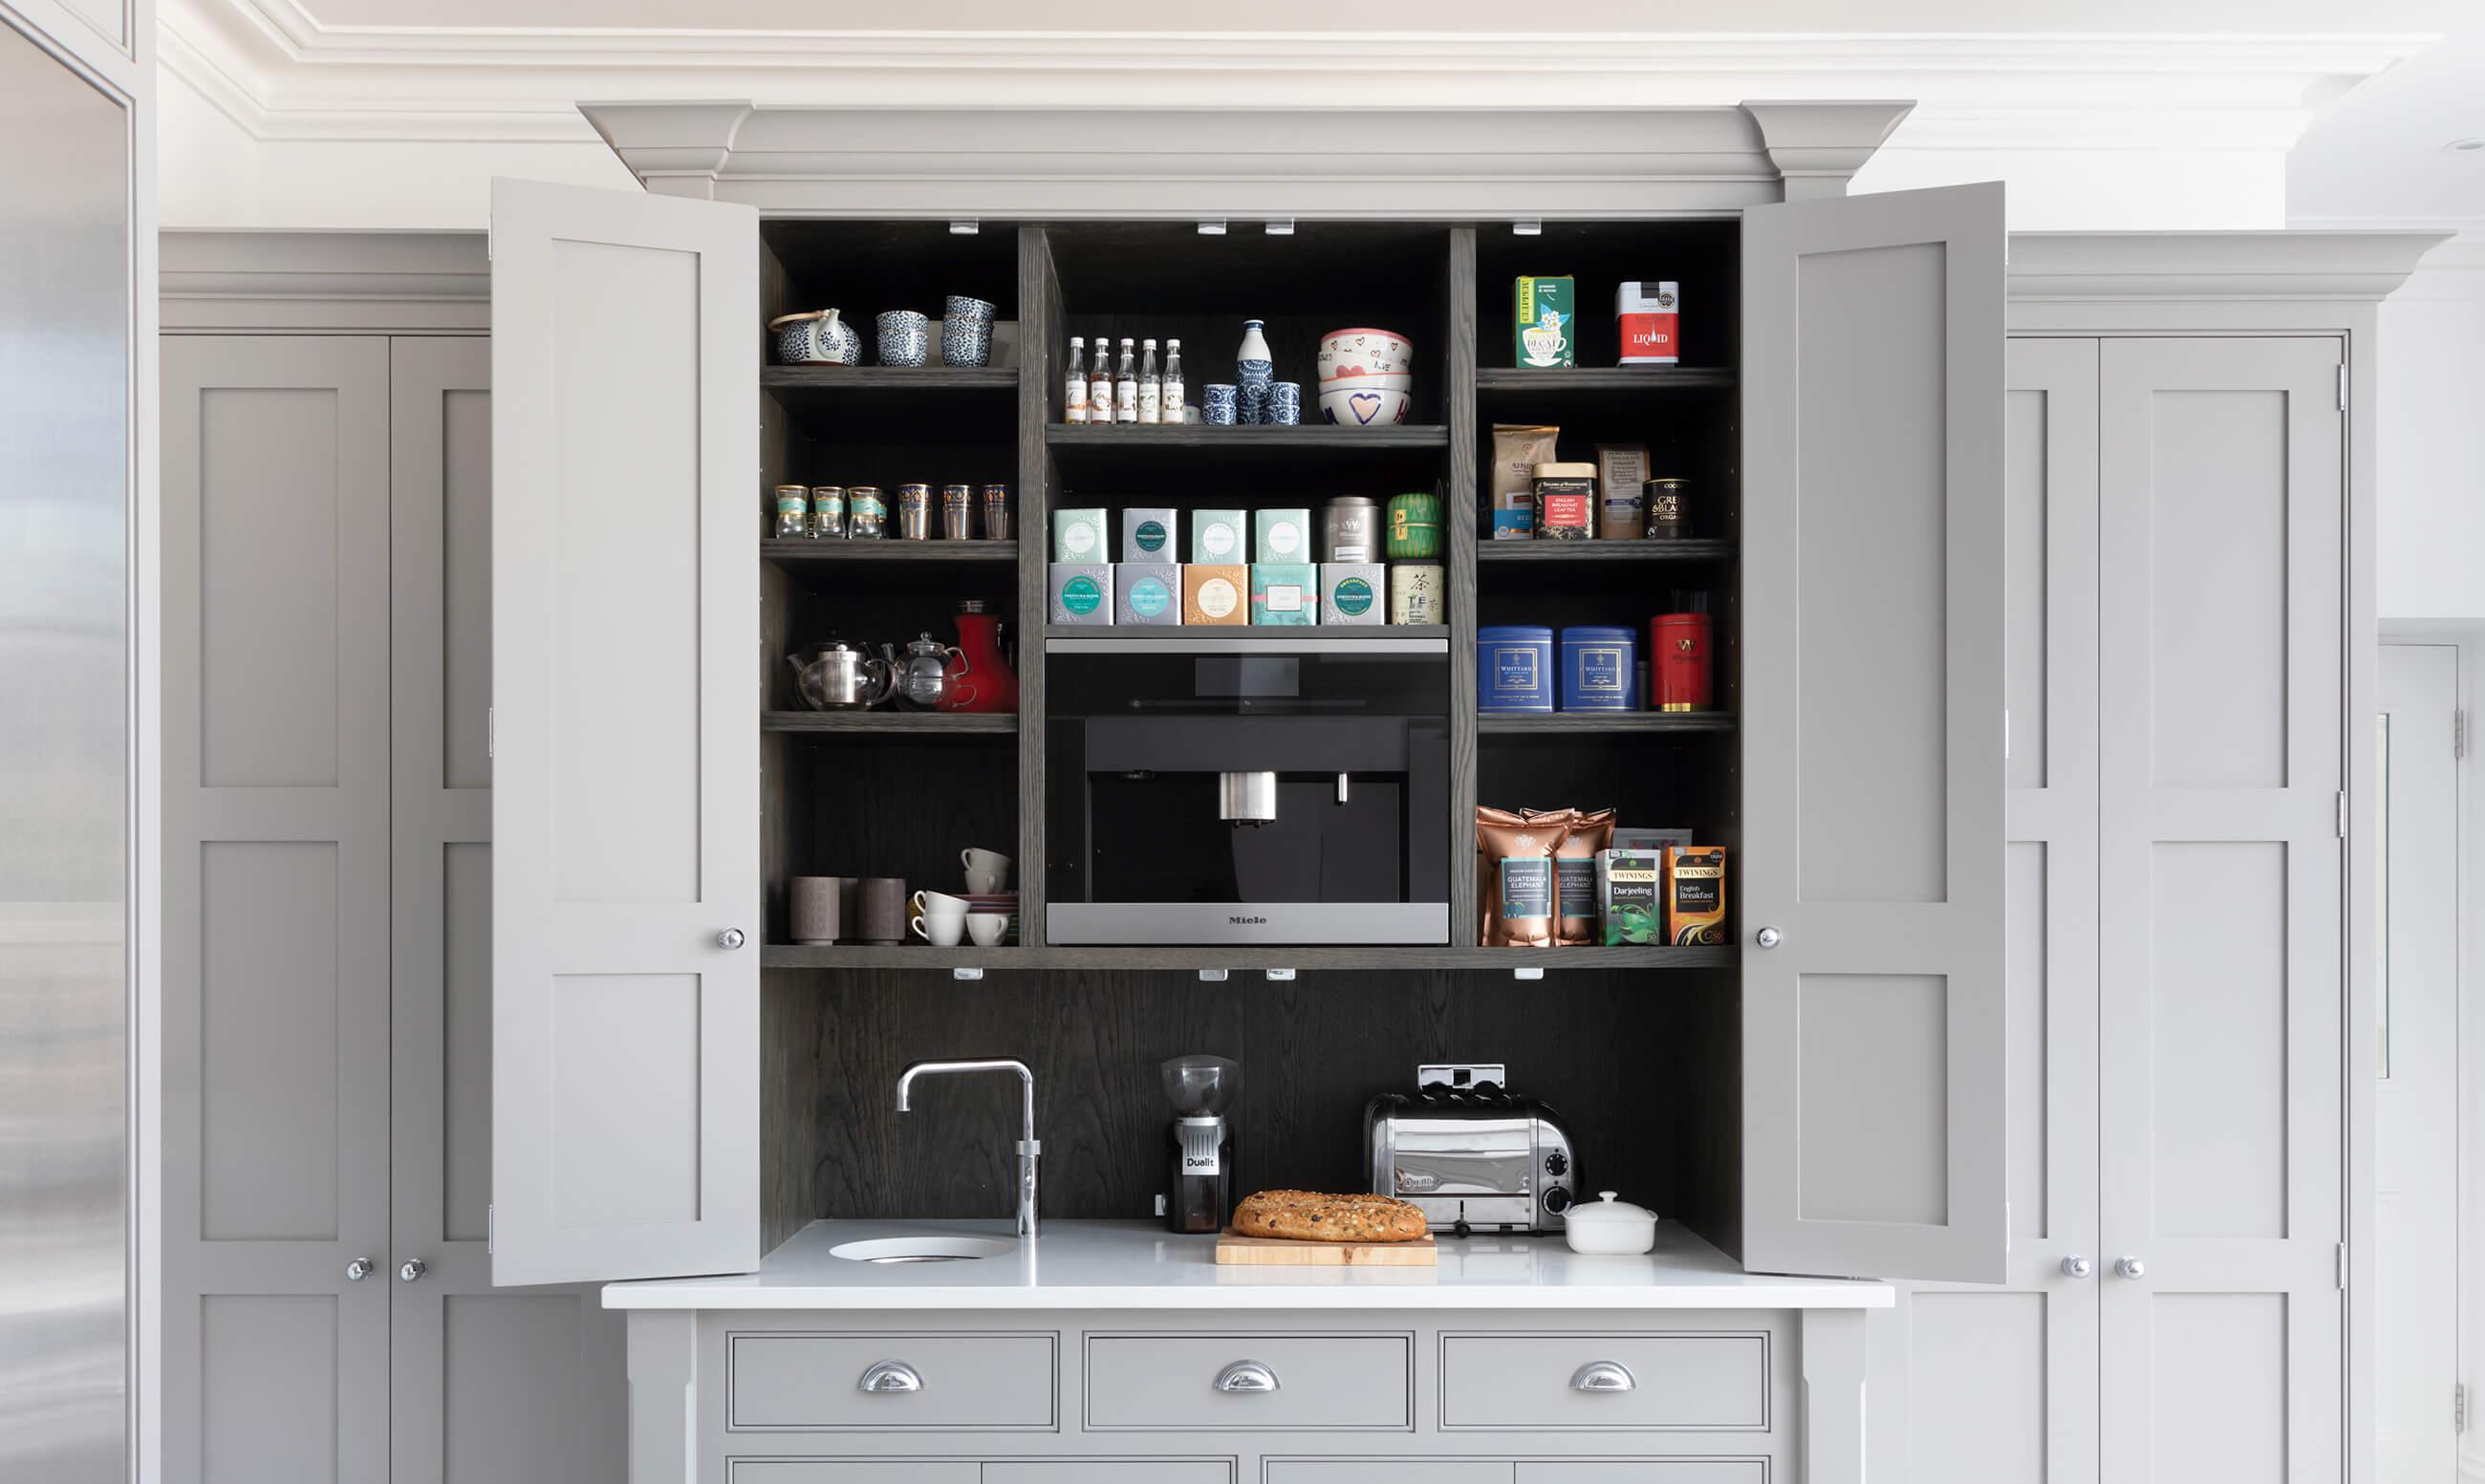 a look inside the breakfast pantry